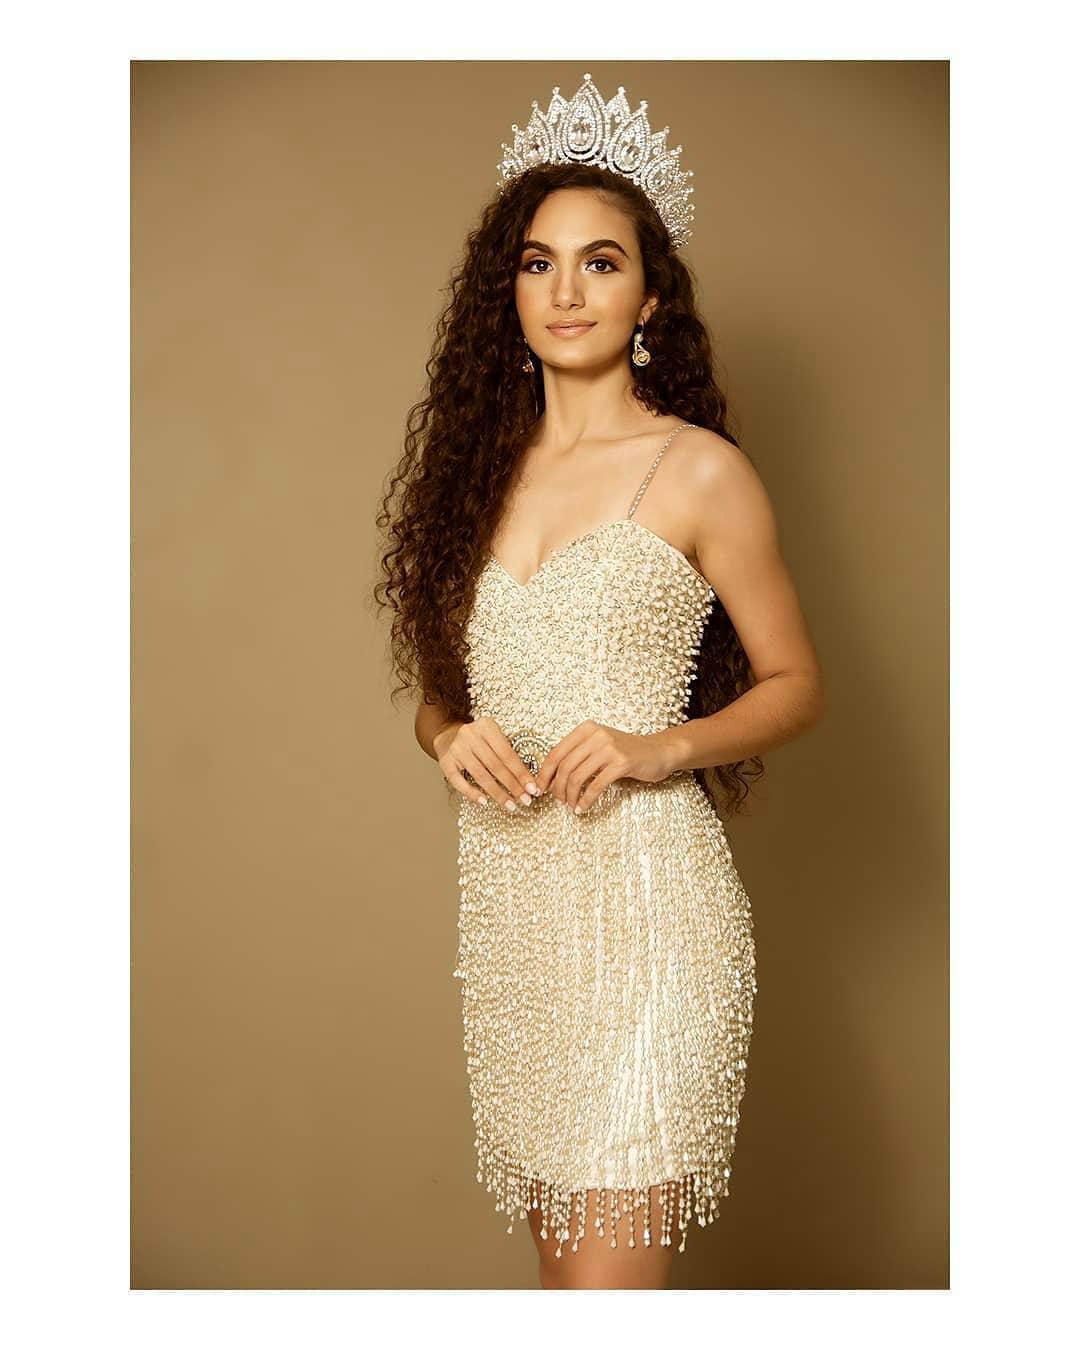 maria luiza marim, miss brasil teen americas 2019. 56887210